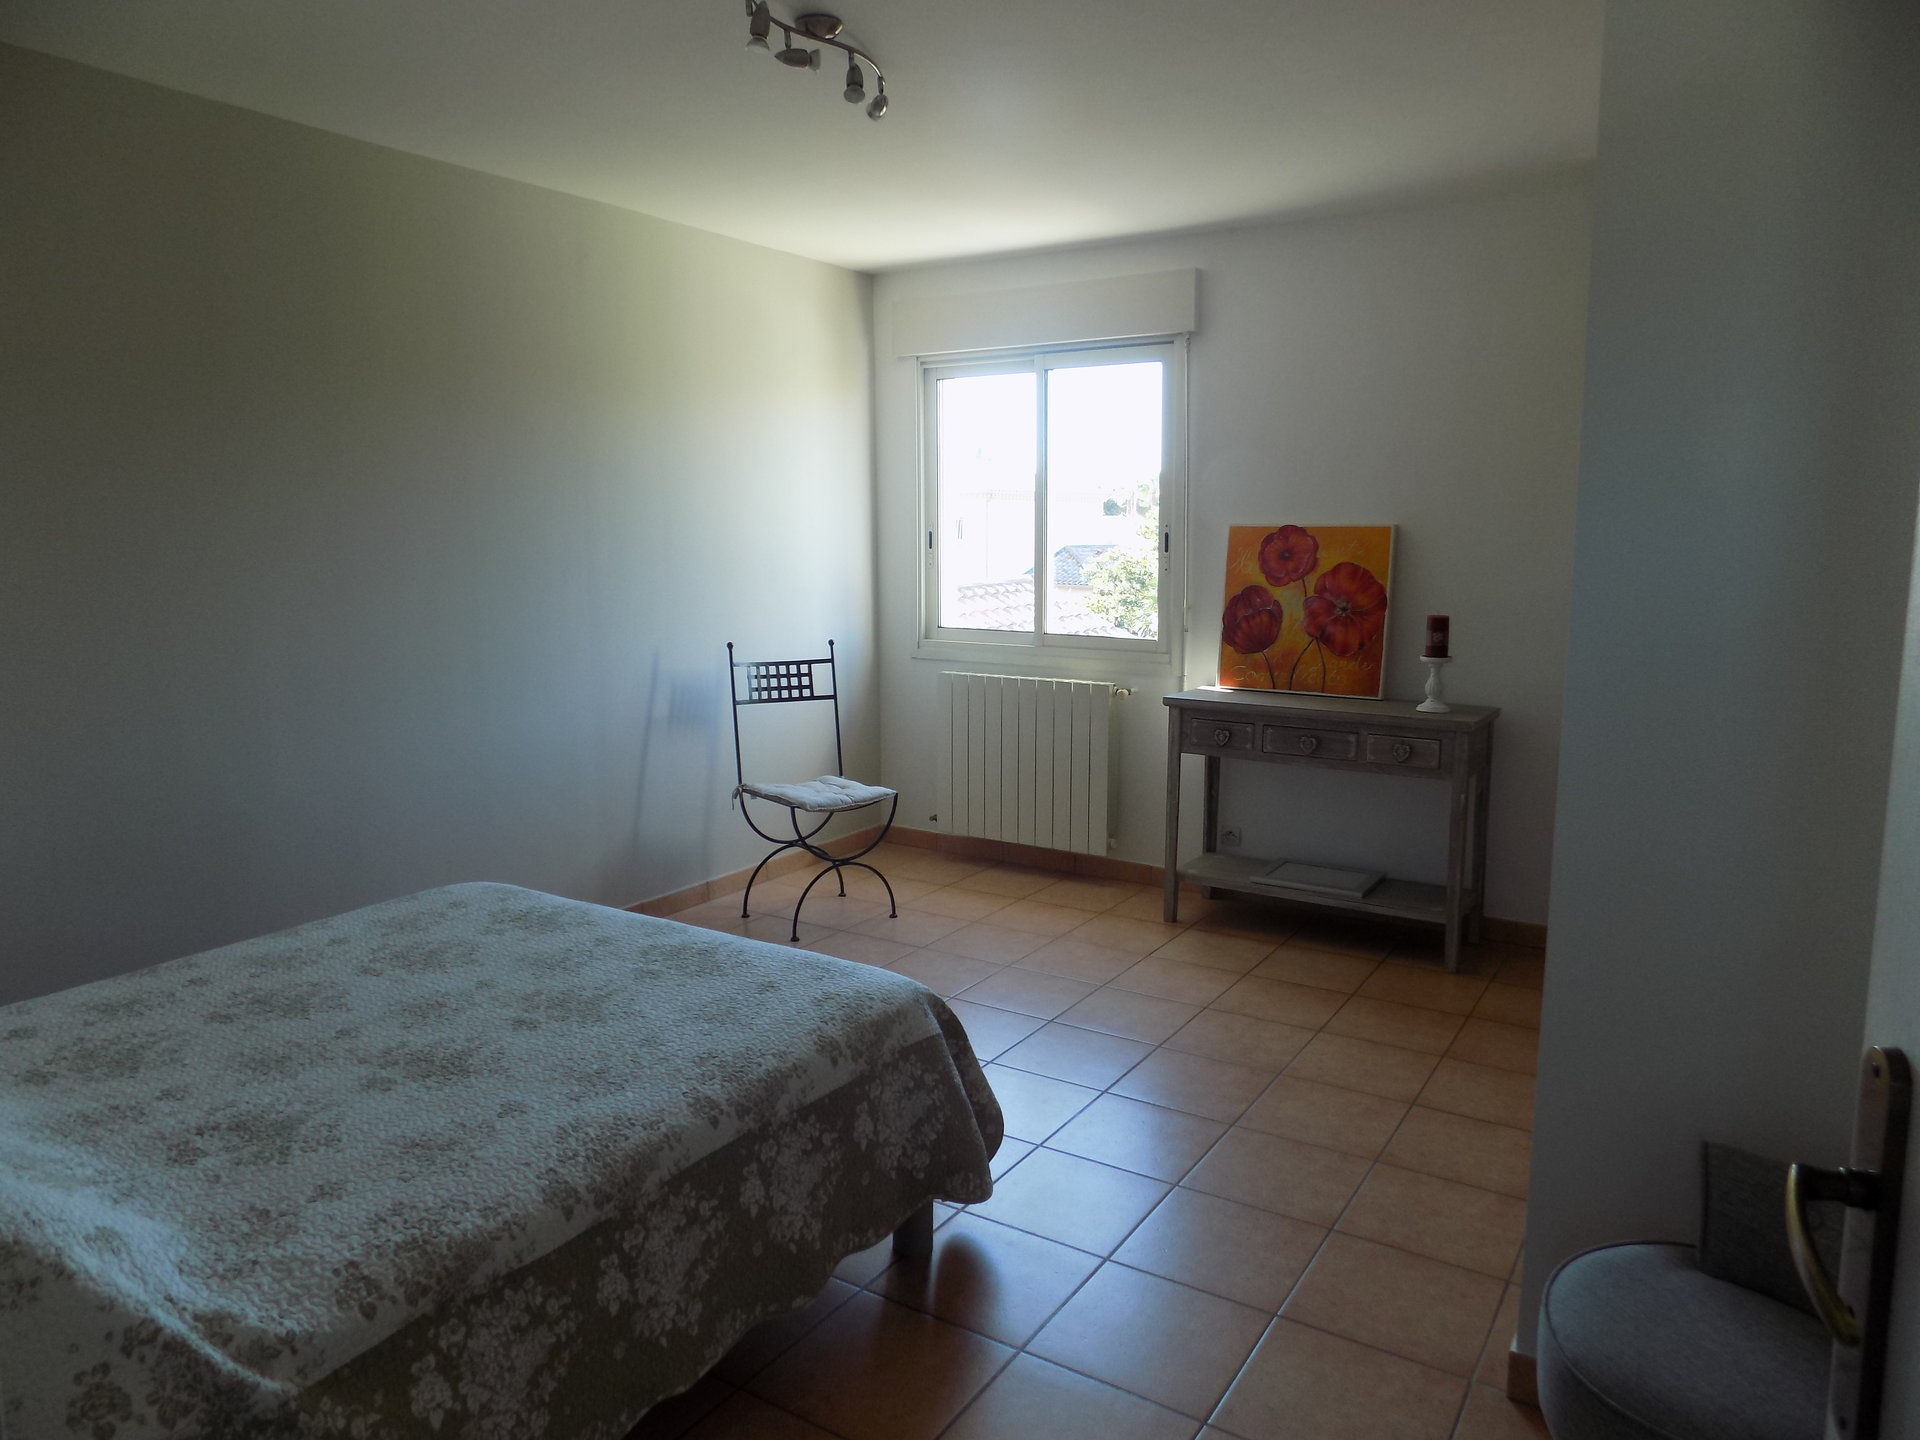 Villa 160m² 3 chambres + bureau piscine garage 1000m² de terrain, proche mer